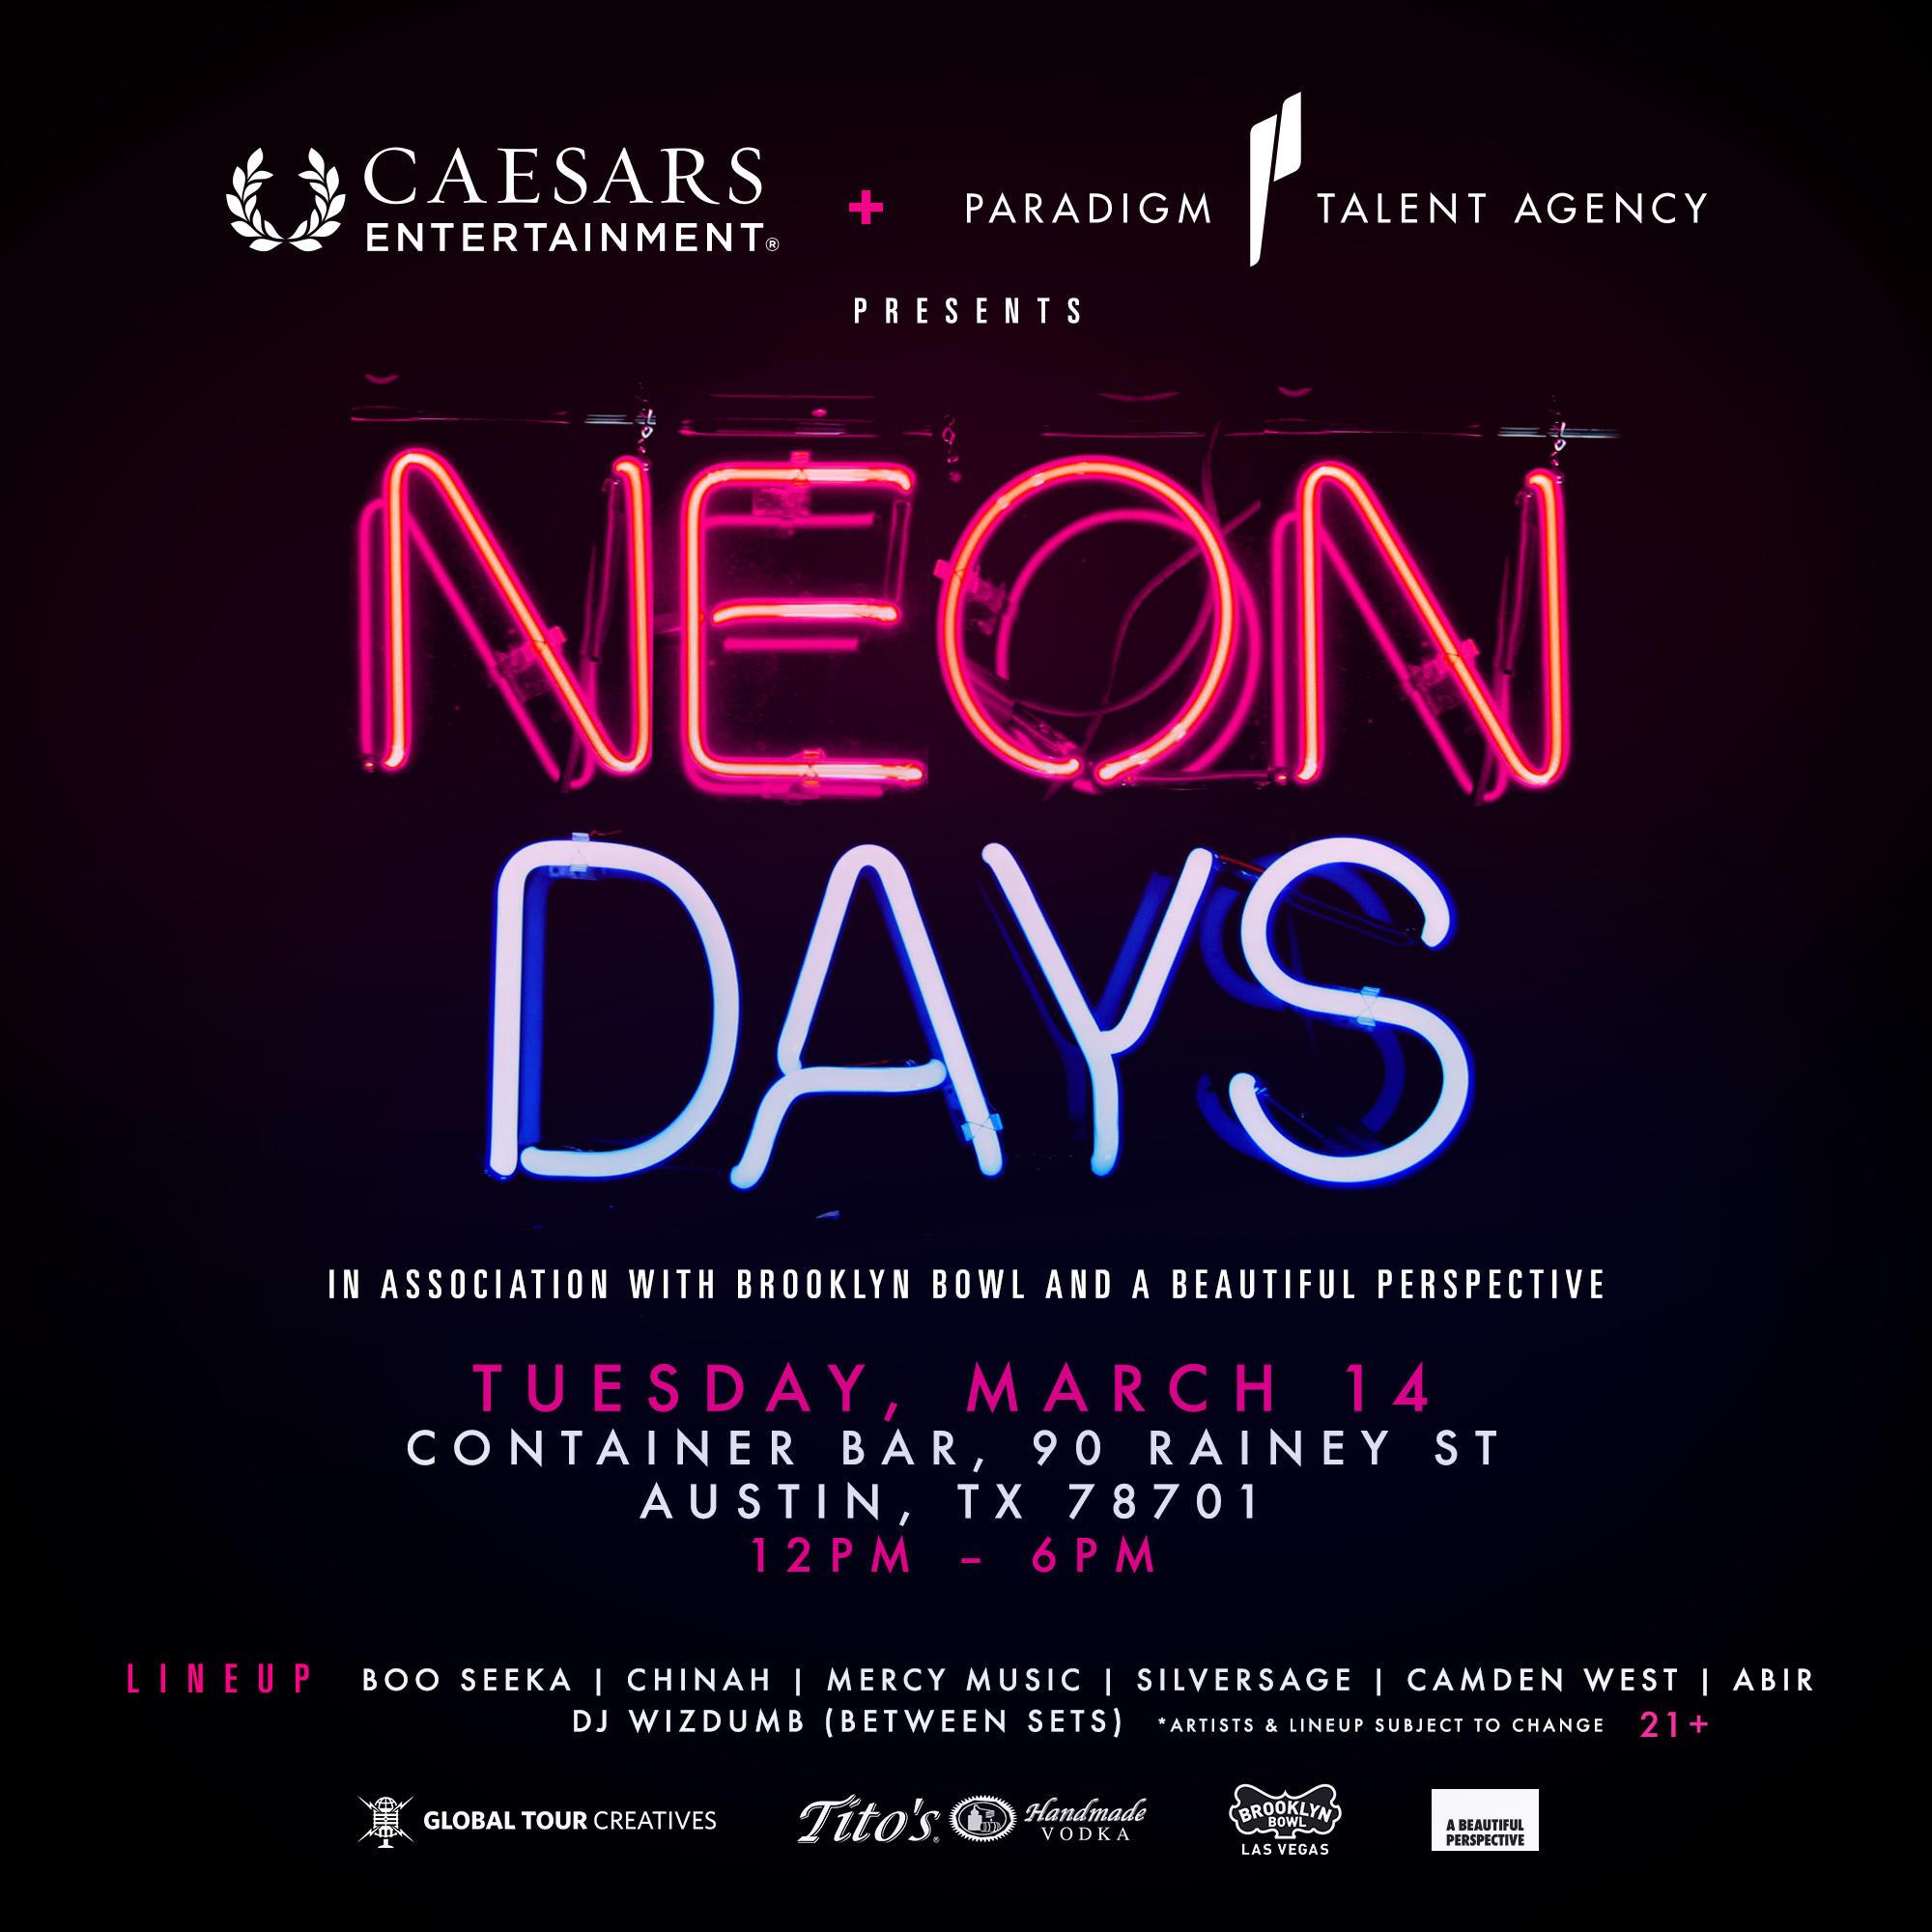 neon_days_sxsw_2017_ftrd